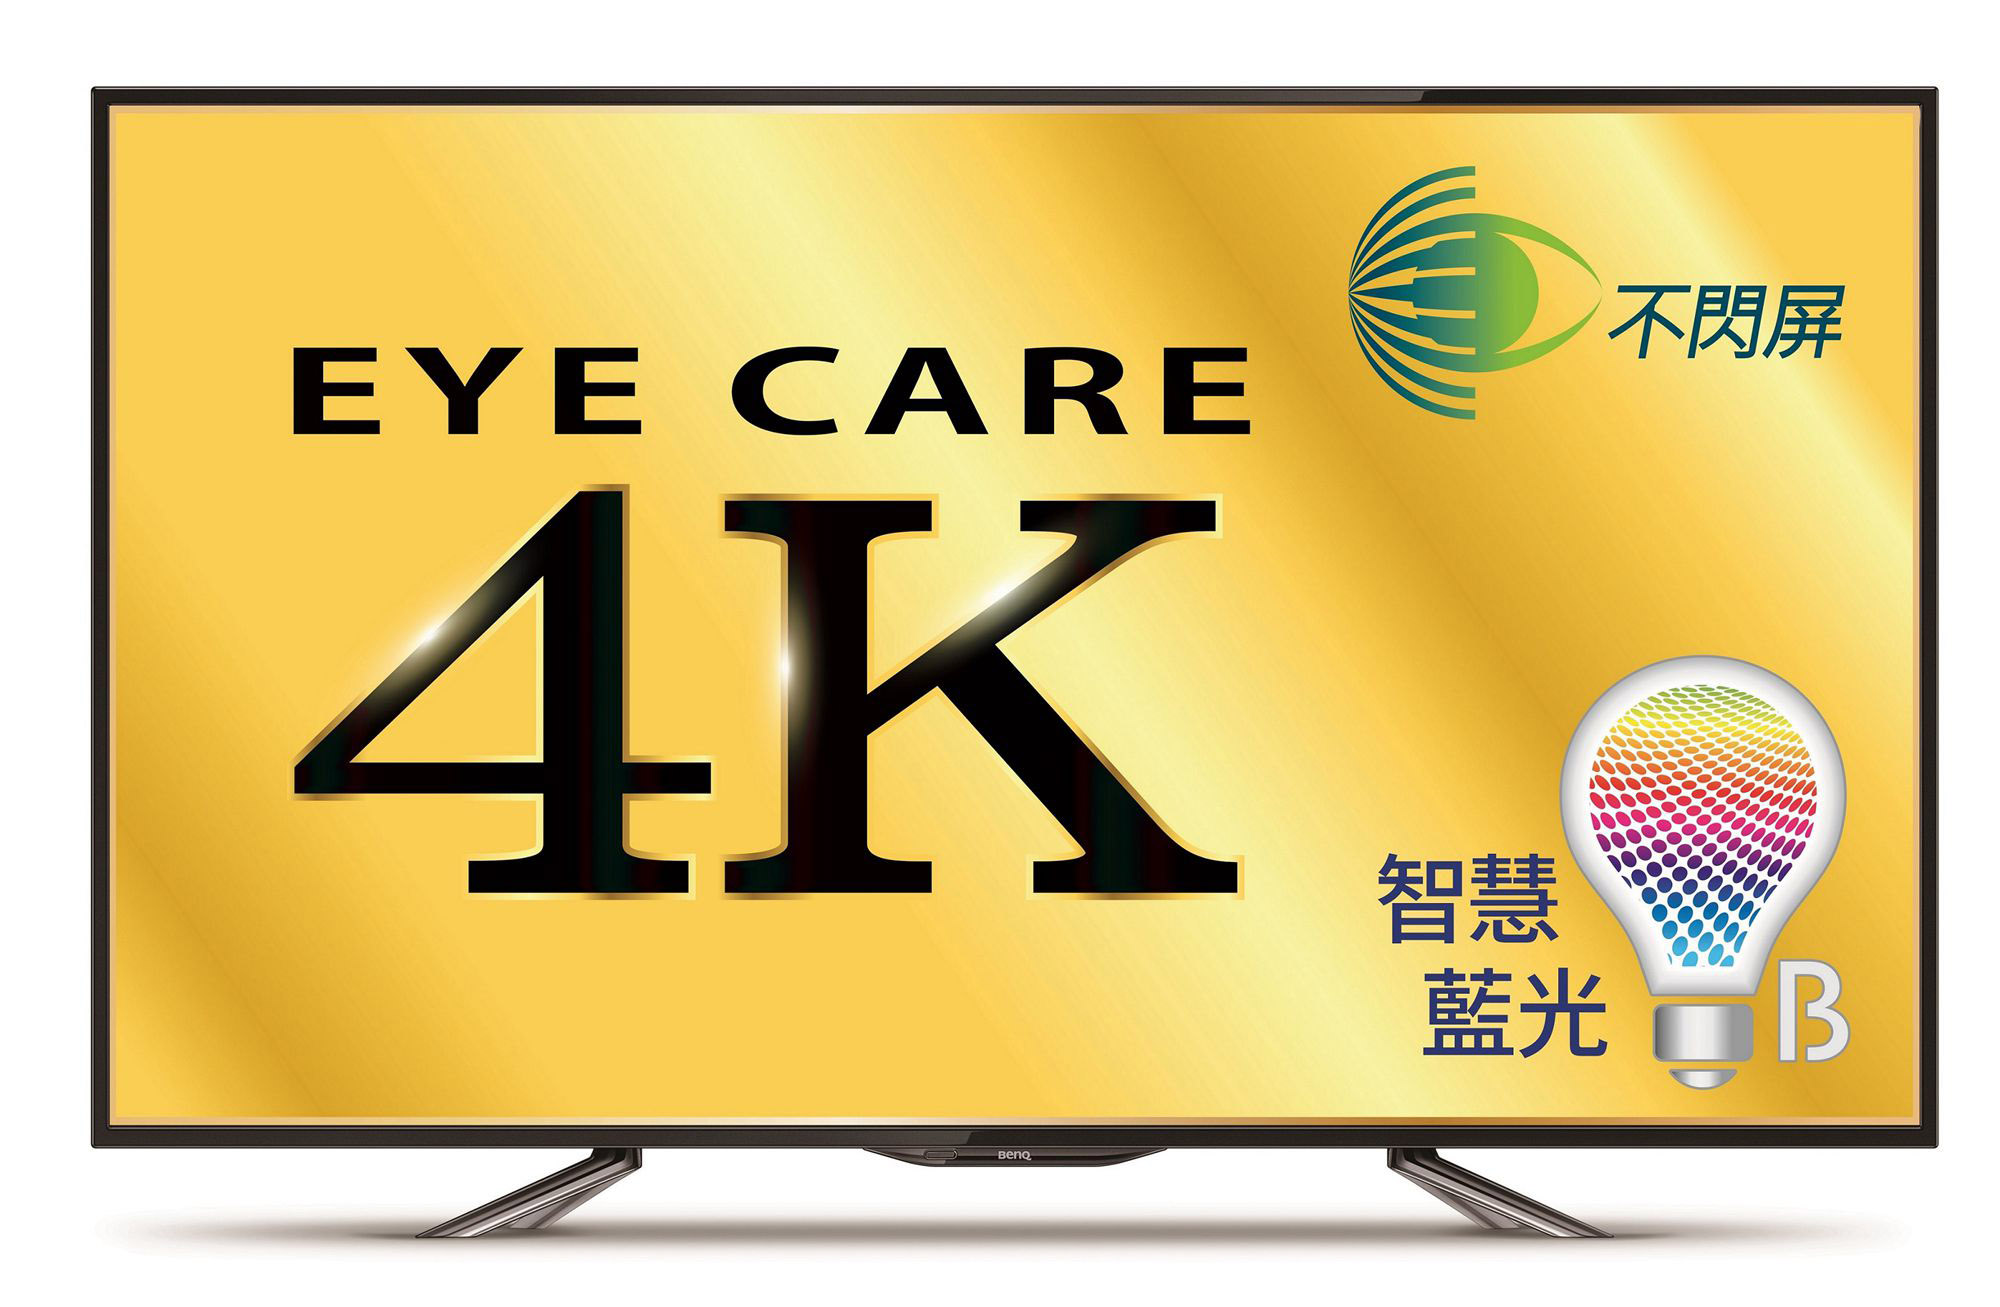 BenQ護眼4K大型液晶,雙重升級,全新上市,還有好禮大方送